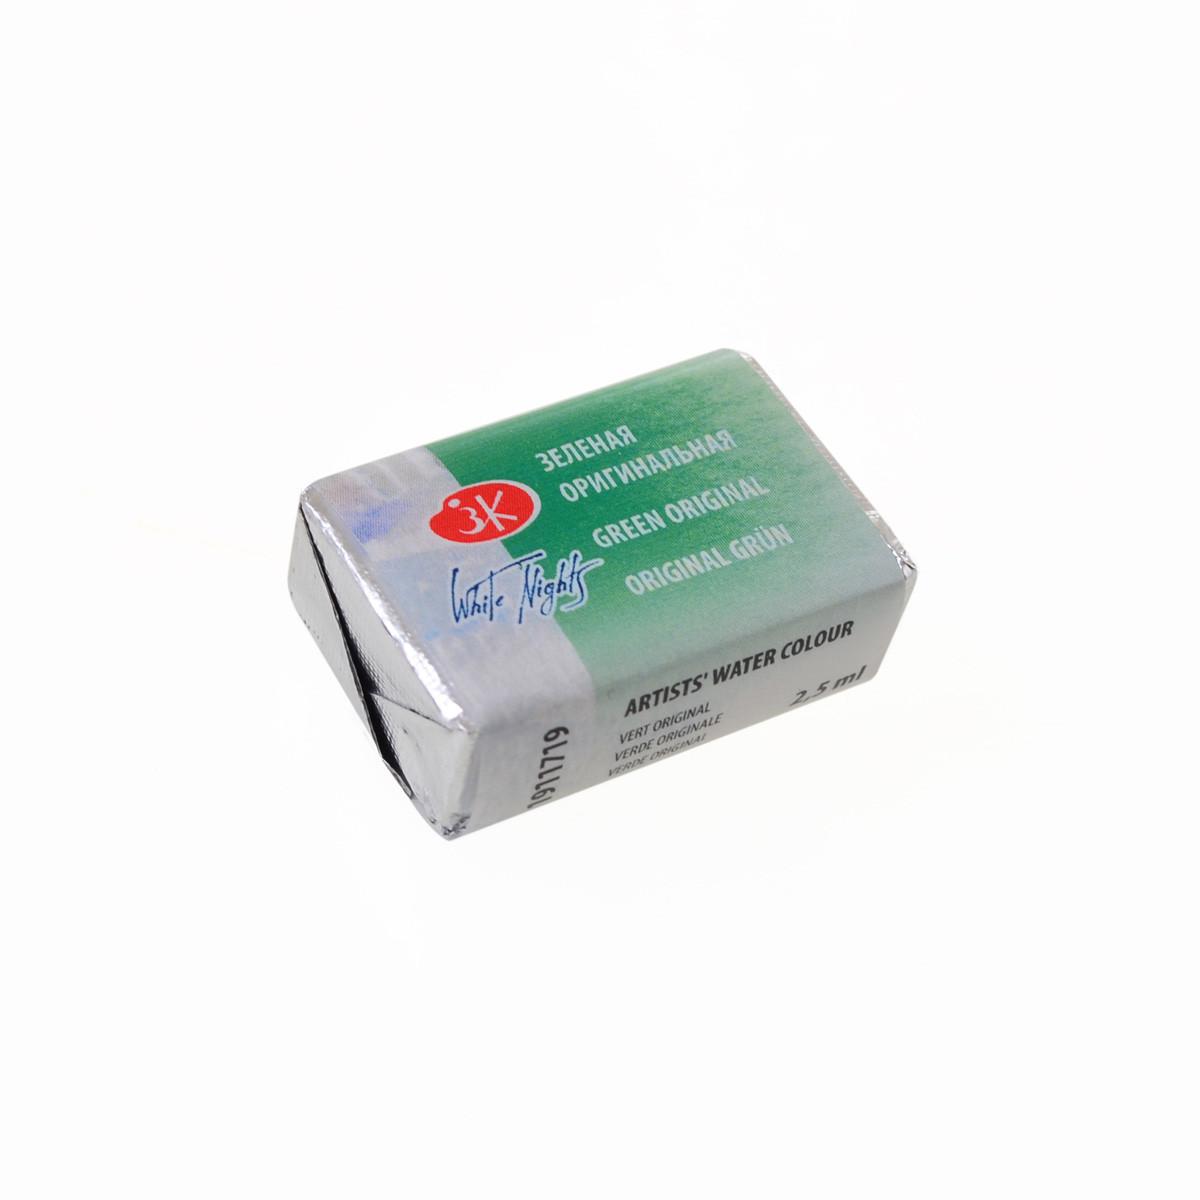 Краска акварельная КЮВЕТА, зеленая оригинальная, 2.5мл ЗХК